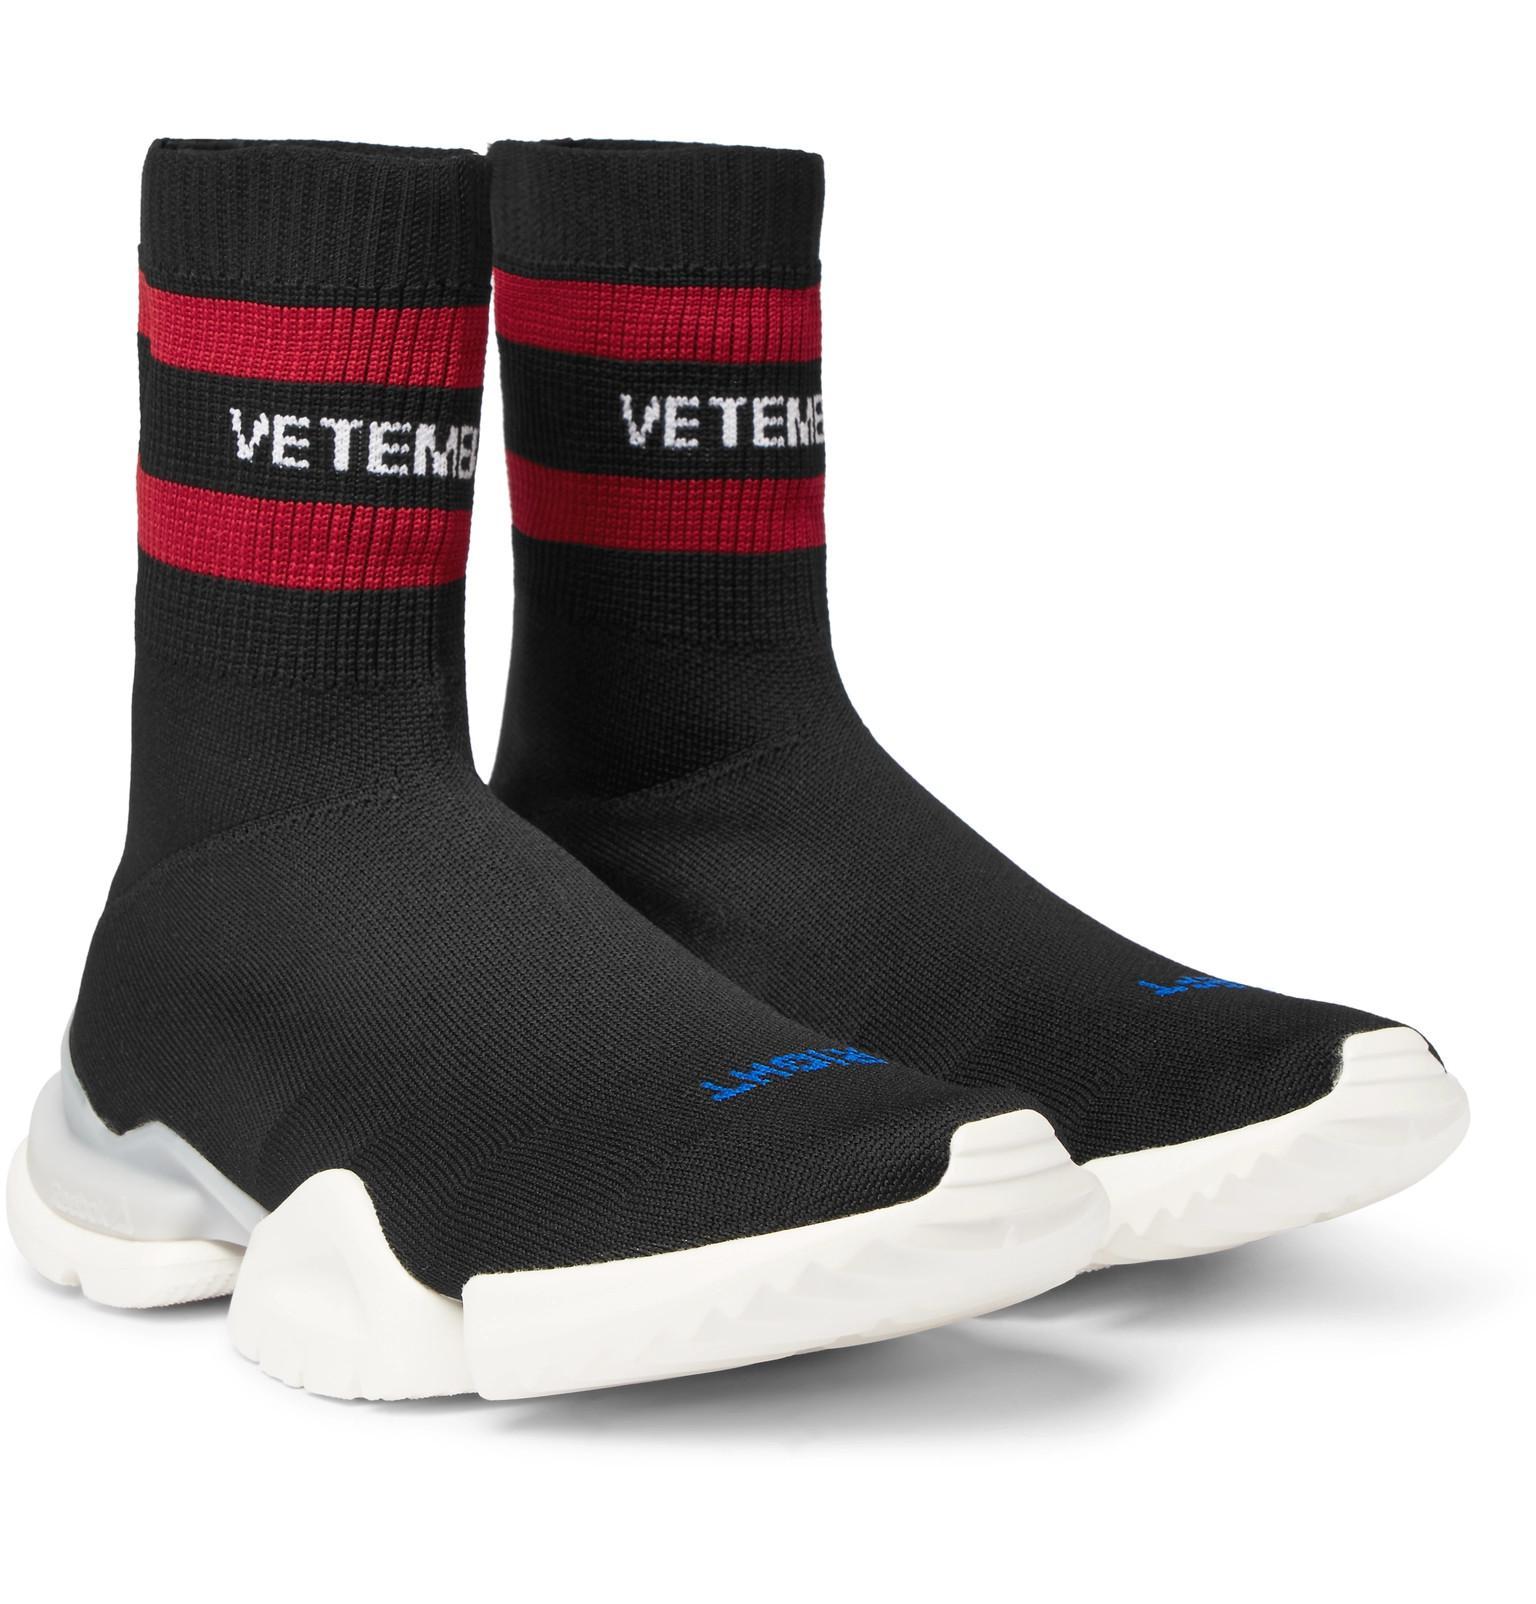 Isabel Marant Black Reebok Edition Sock Pump High-Top Sneakers ZZnKK